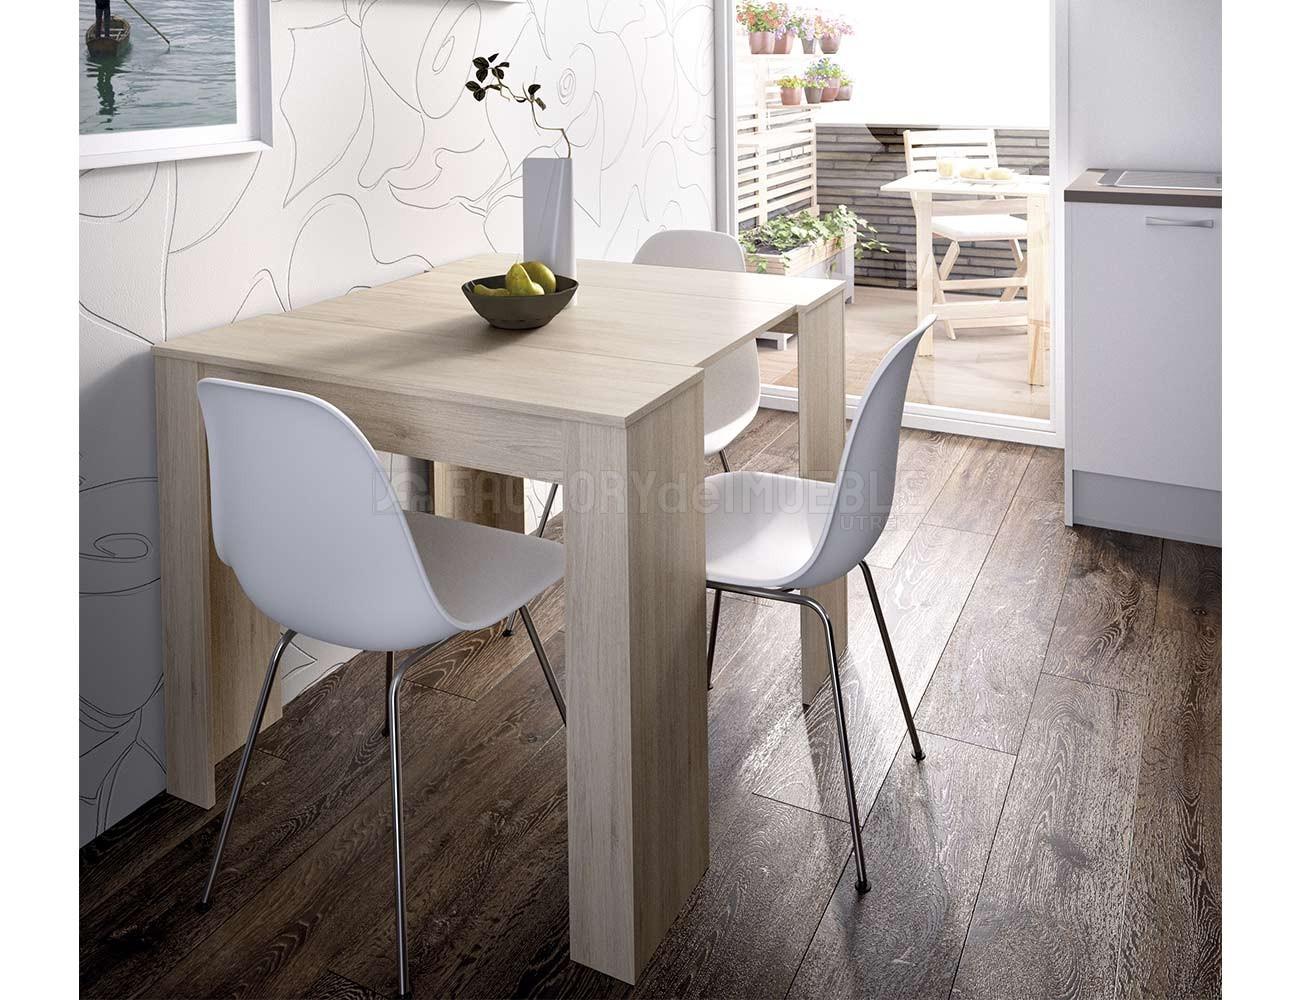 Mesa de comedor extensible y convertible en color natural